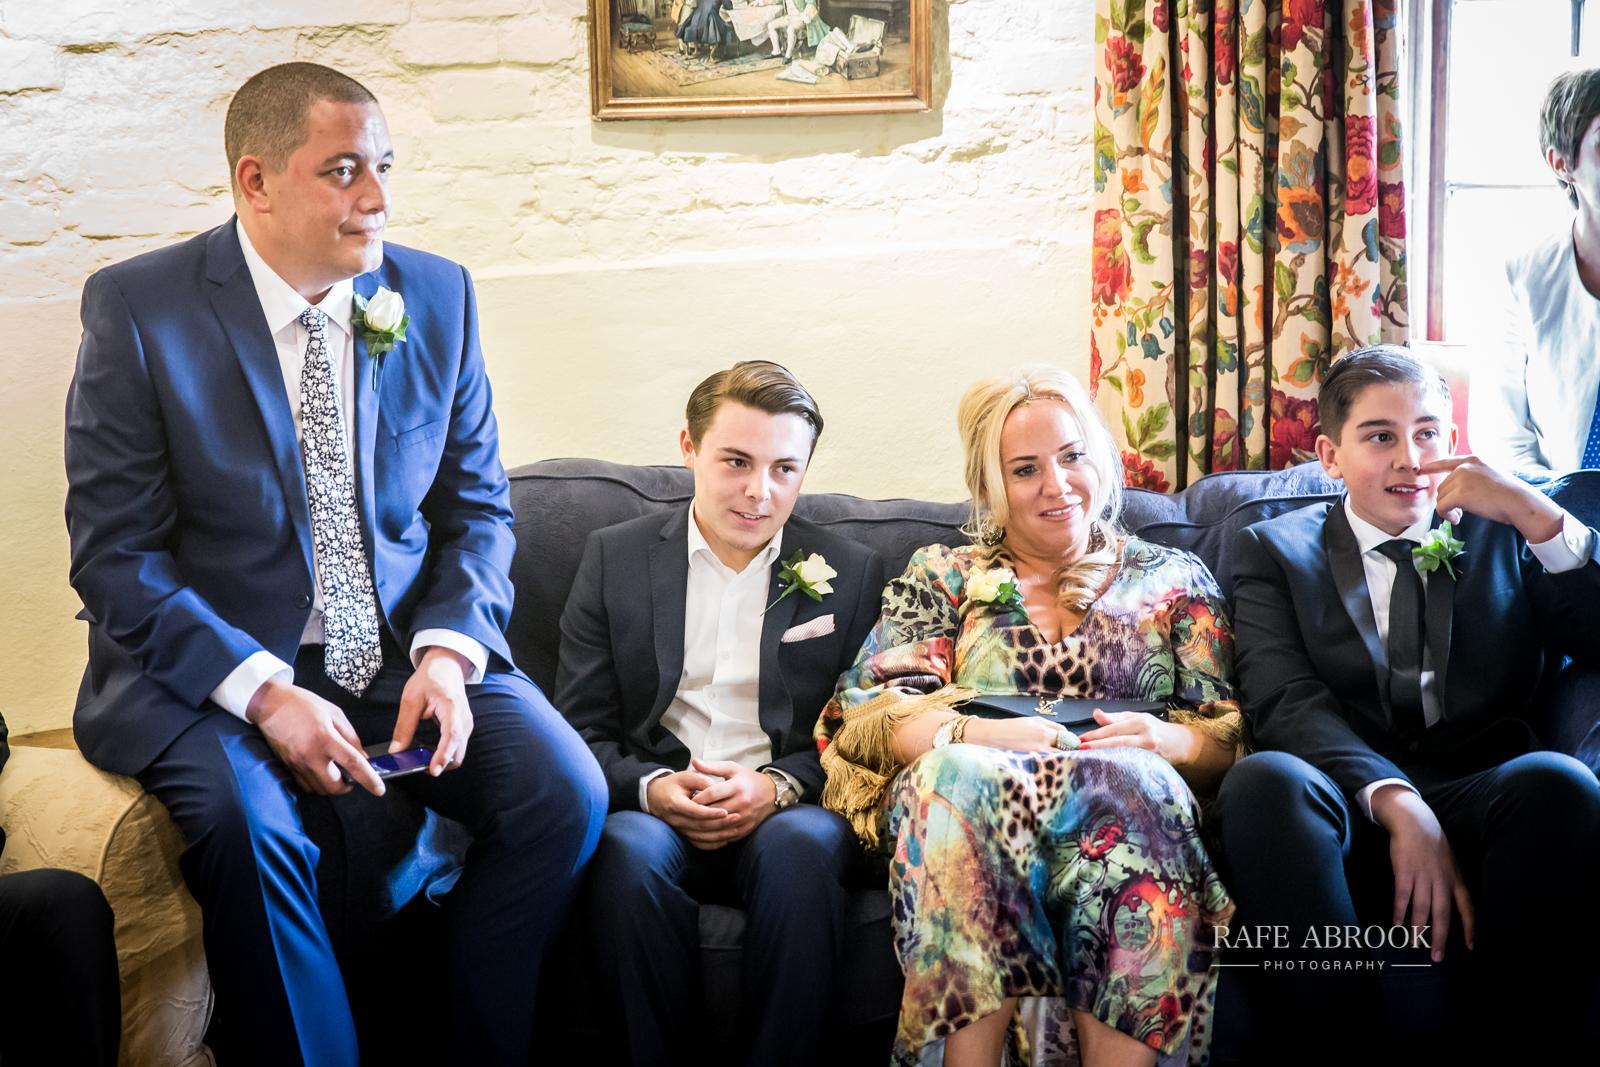 cley windmill wedding norfolk hertfordshire wedding photographer-1116.jpg